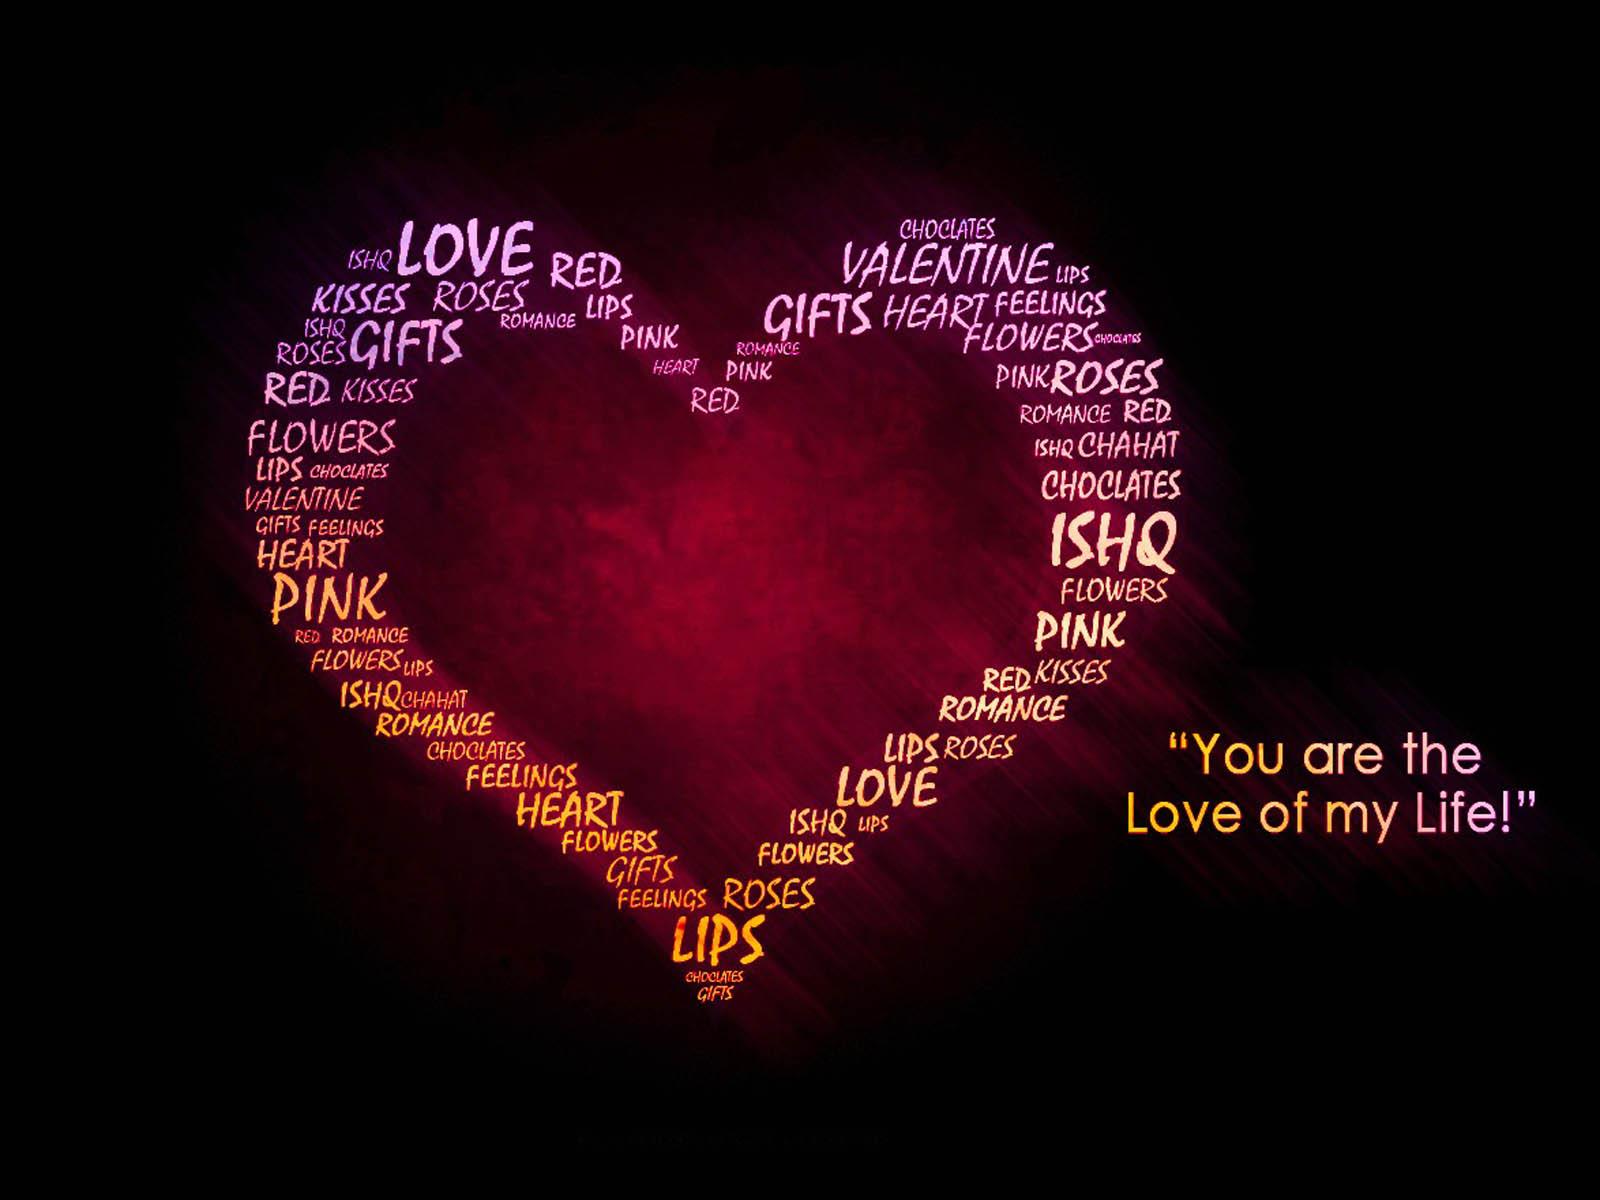 Quotes Wallpapers LoveQuotes Desktop Love 1600x1200